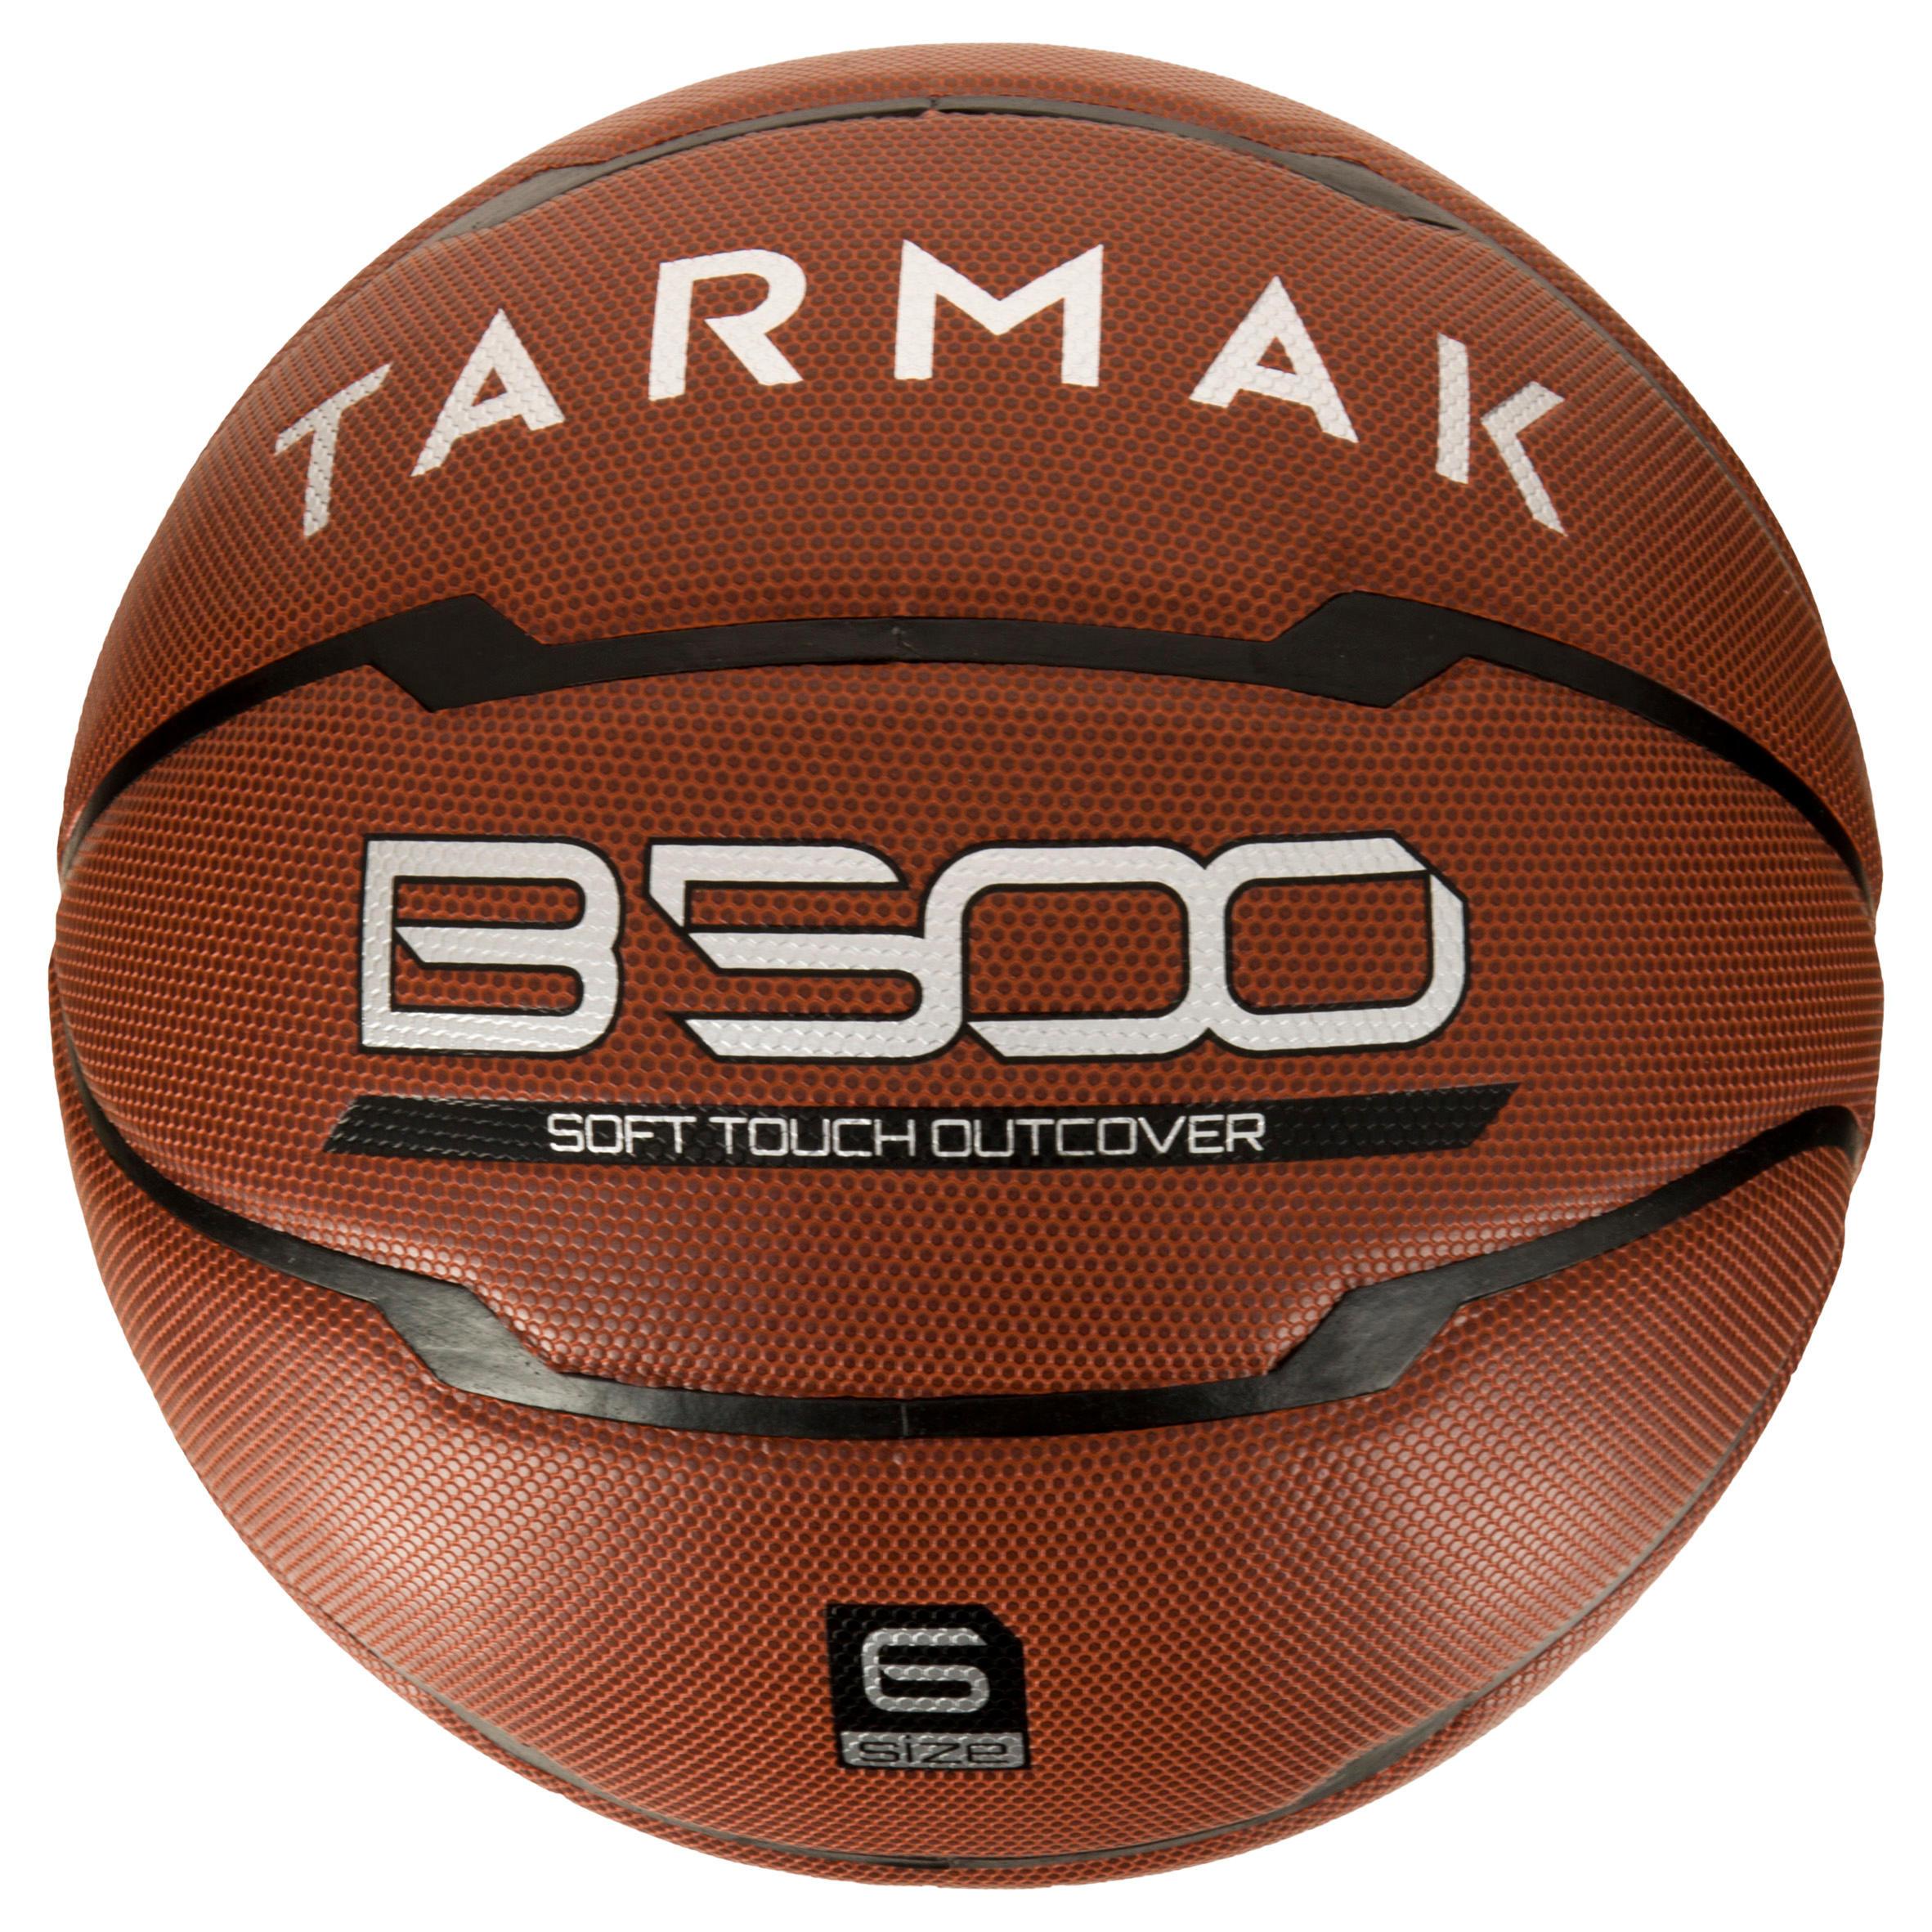 Tarmak Basketbal B500 maat 6 dames bruin. Kunstleer. Vanaf 10 jaar.